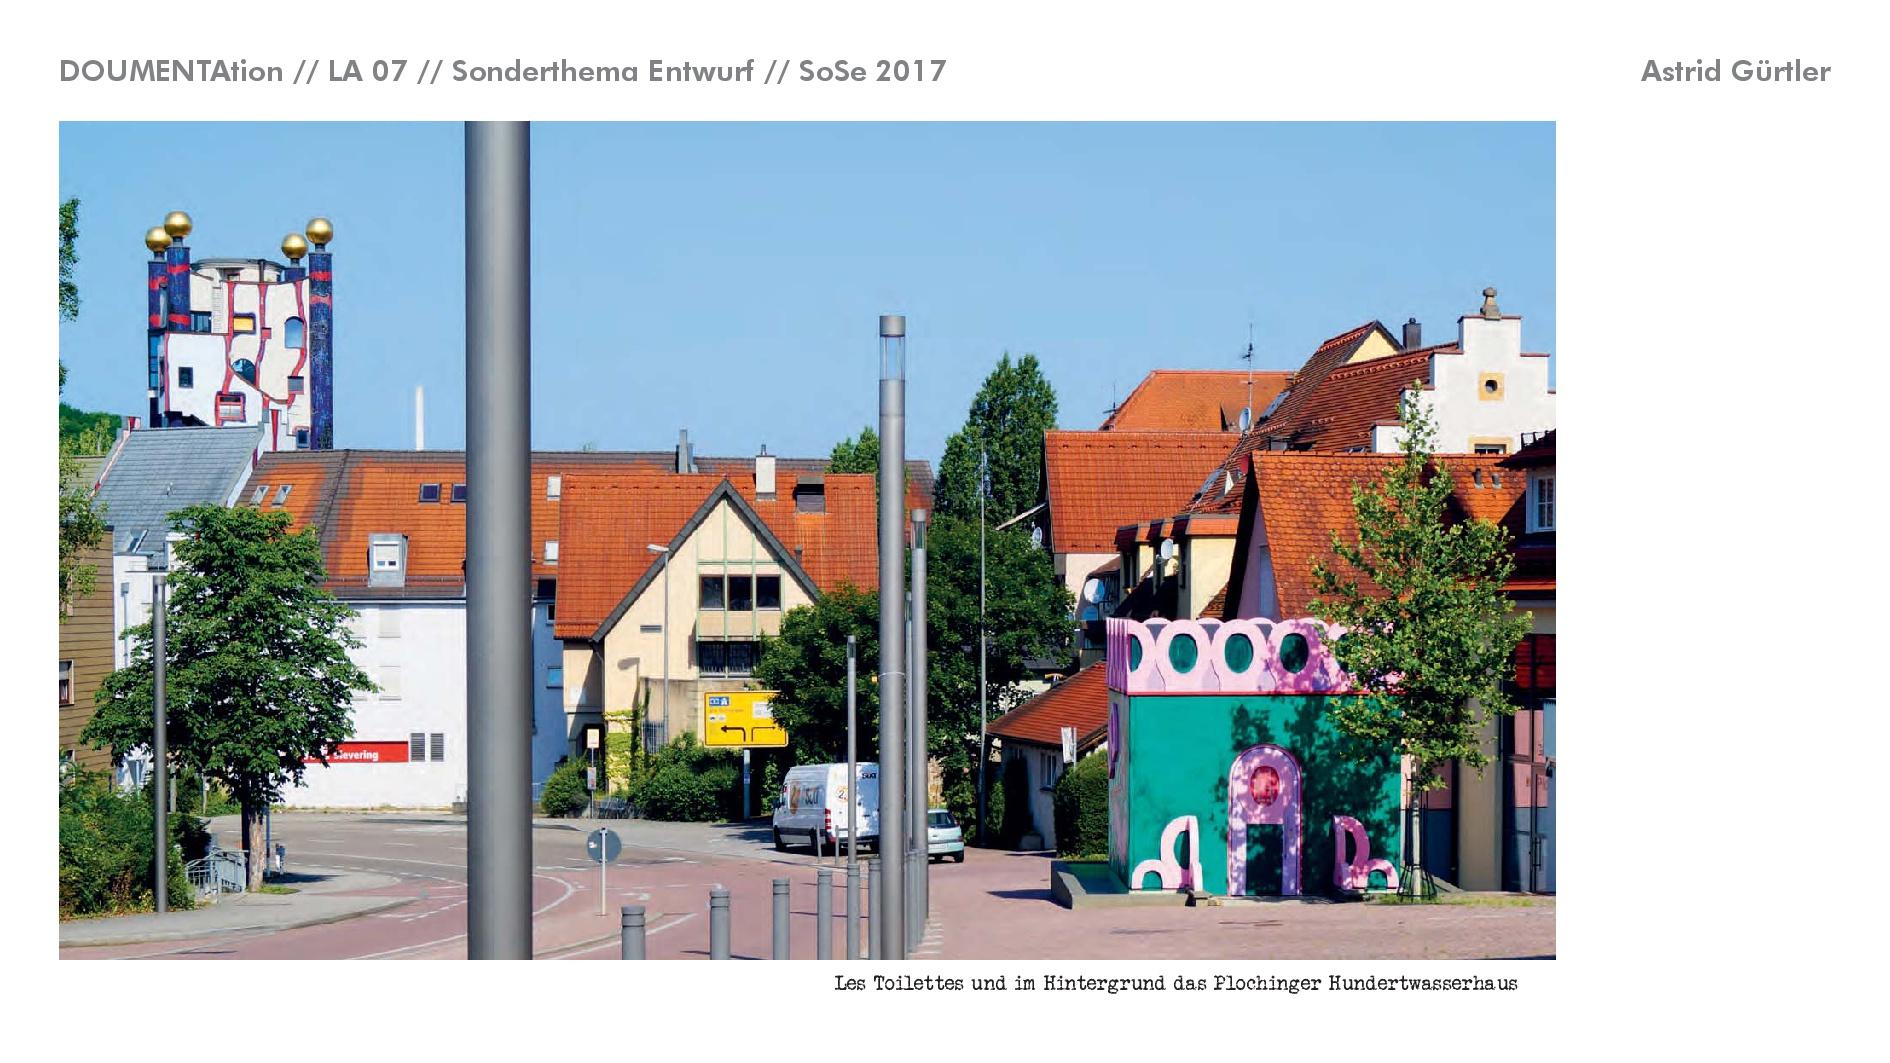 NEU Sonderthema Entwerfen SoSe 17 030